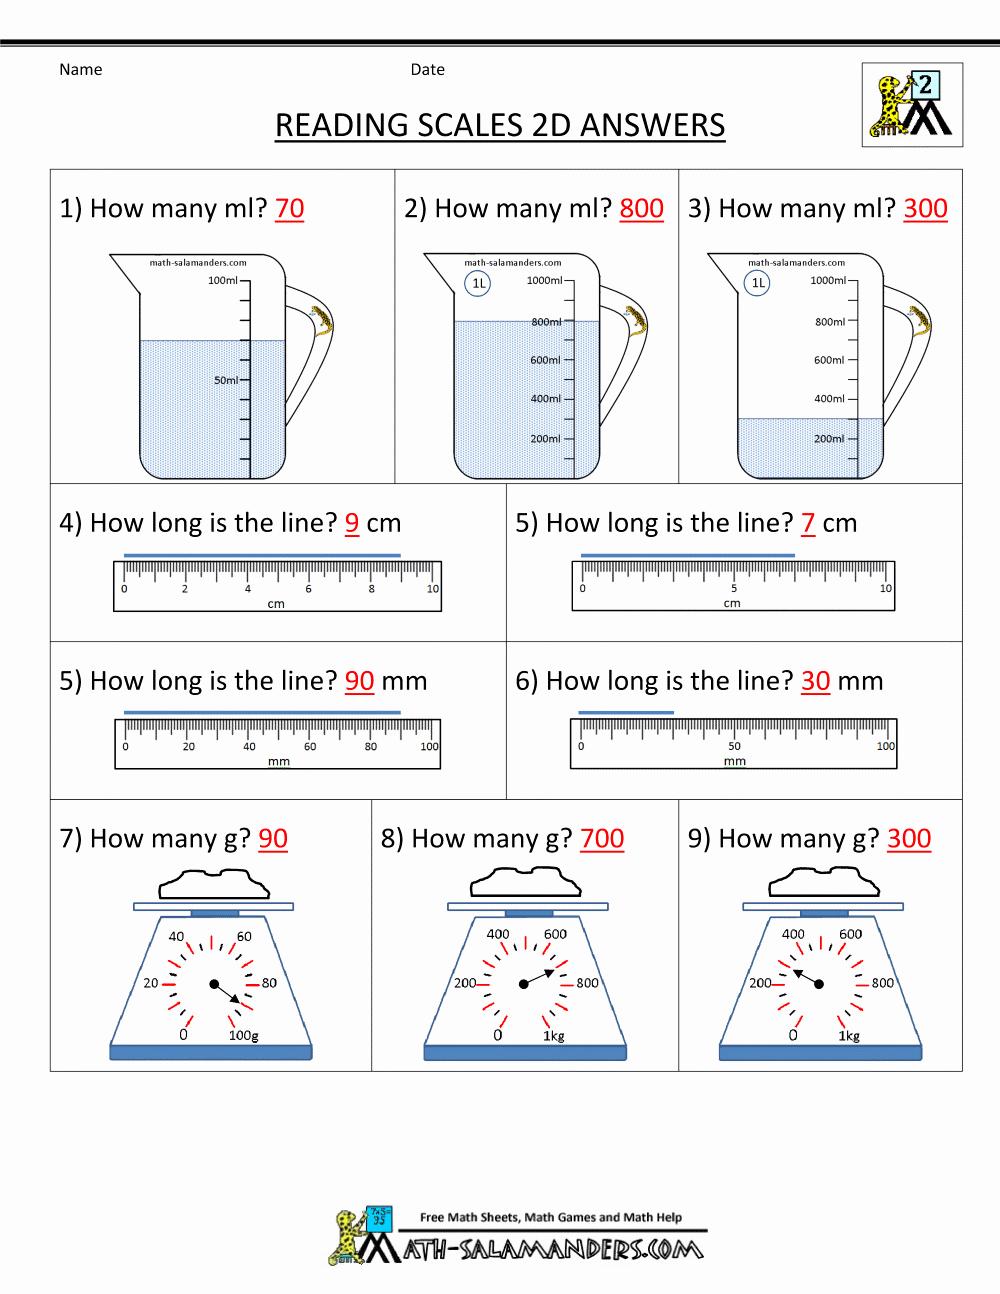 Science Measurement Worksheets Unique 9th Grade Science Worksheets Free Printable